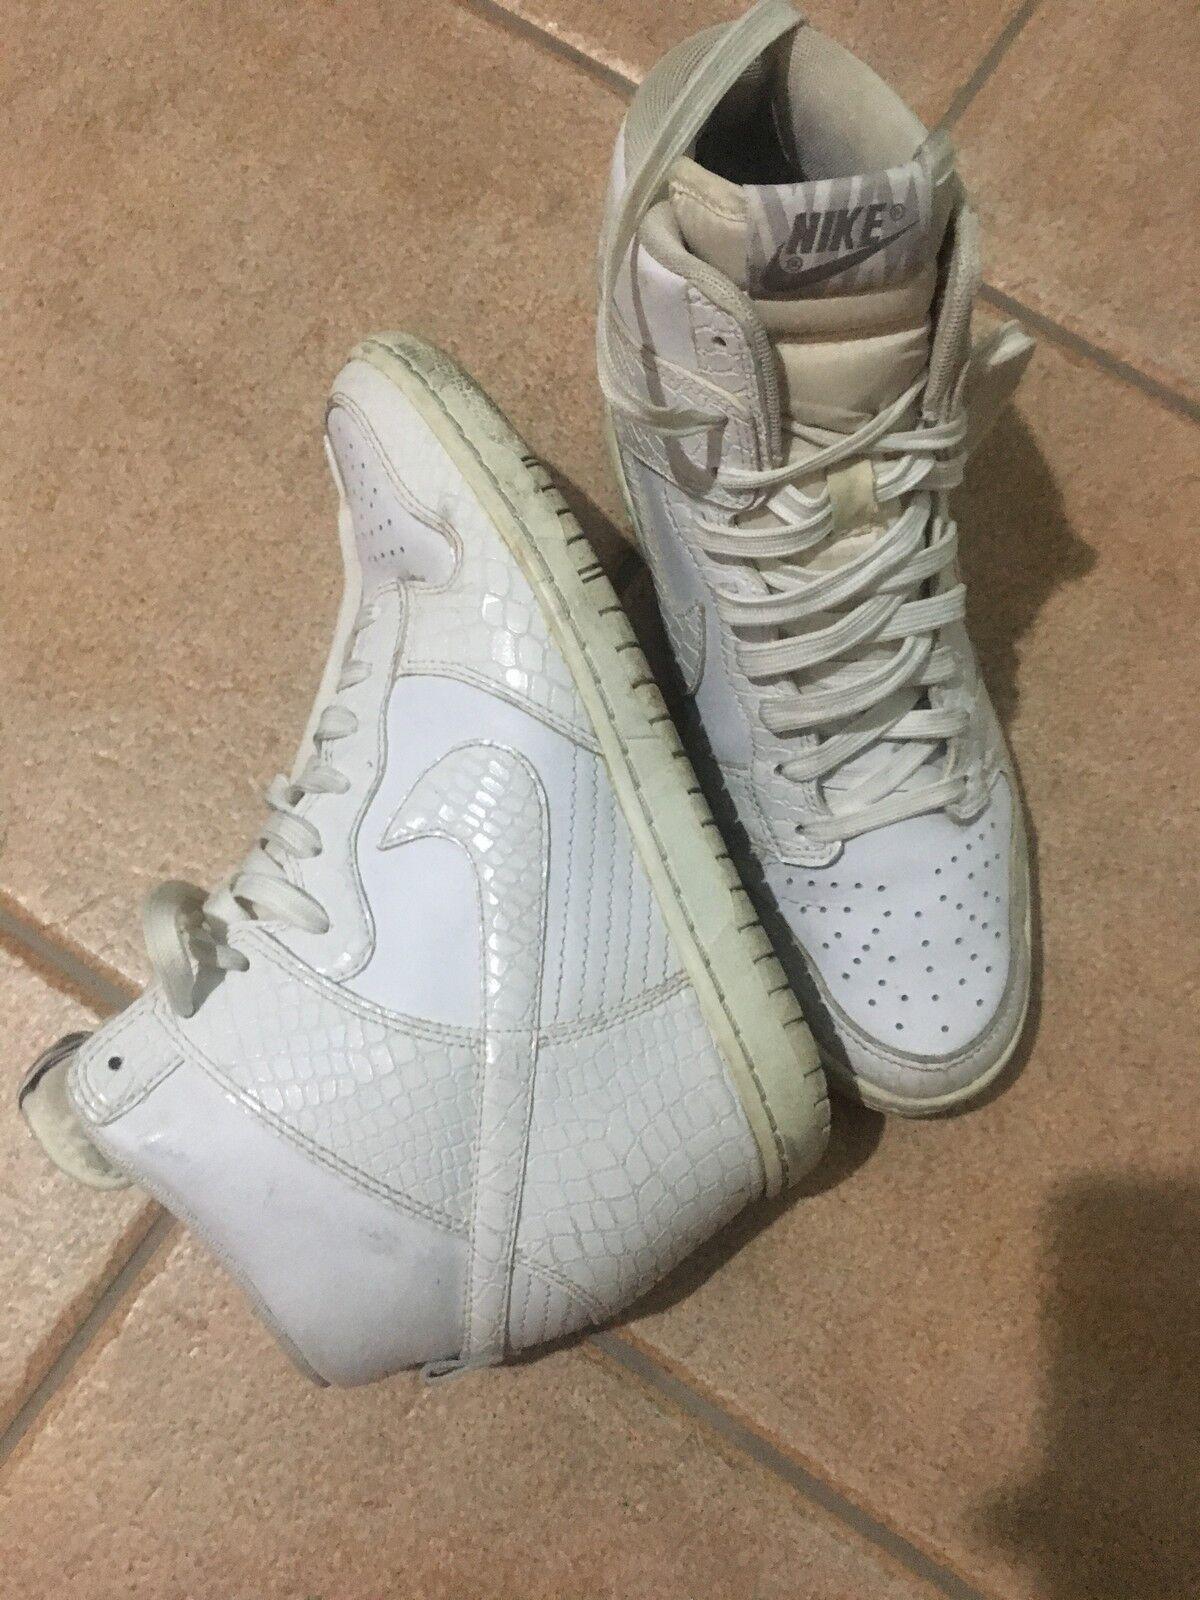 NIKE mujer zapatos mujer NIKE CON RIALZO INTENO NUM Talla 39 2b8d38